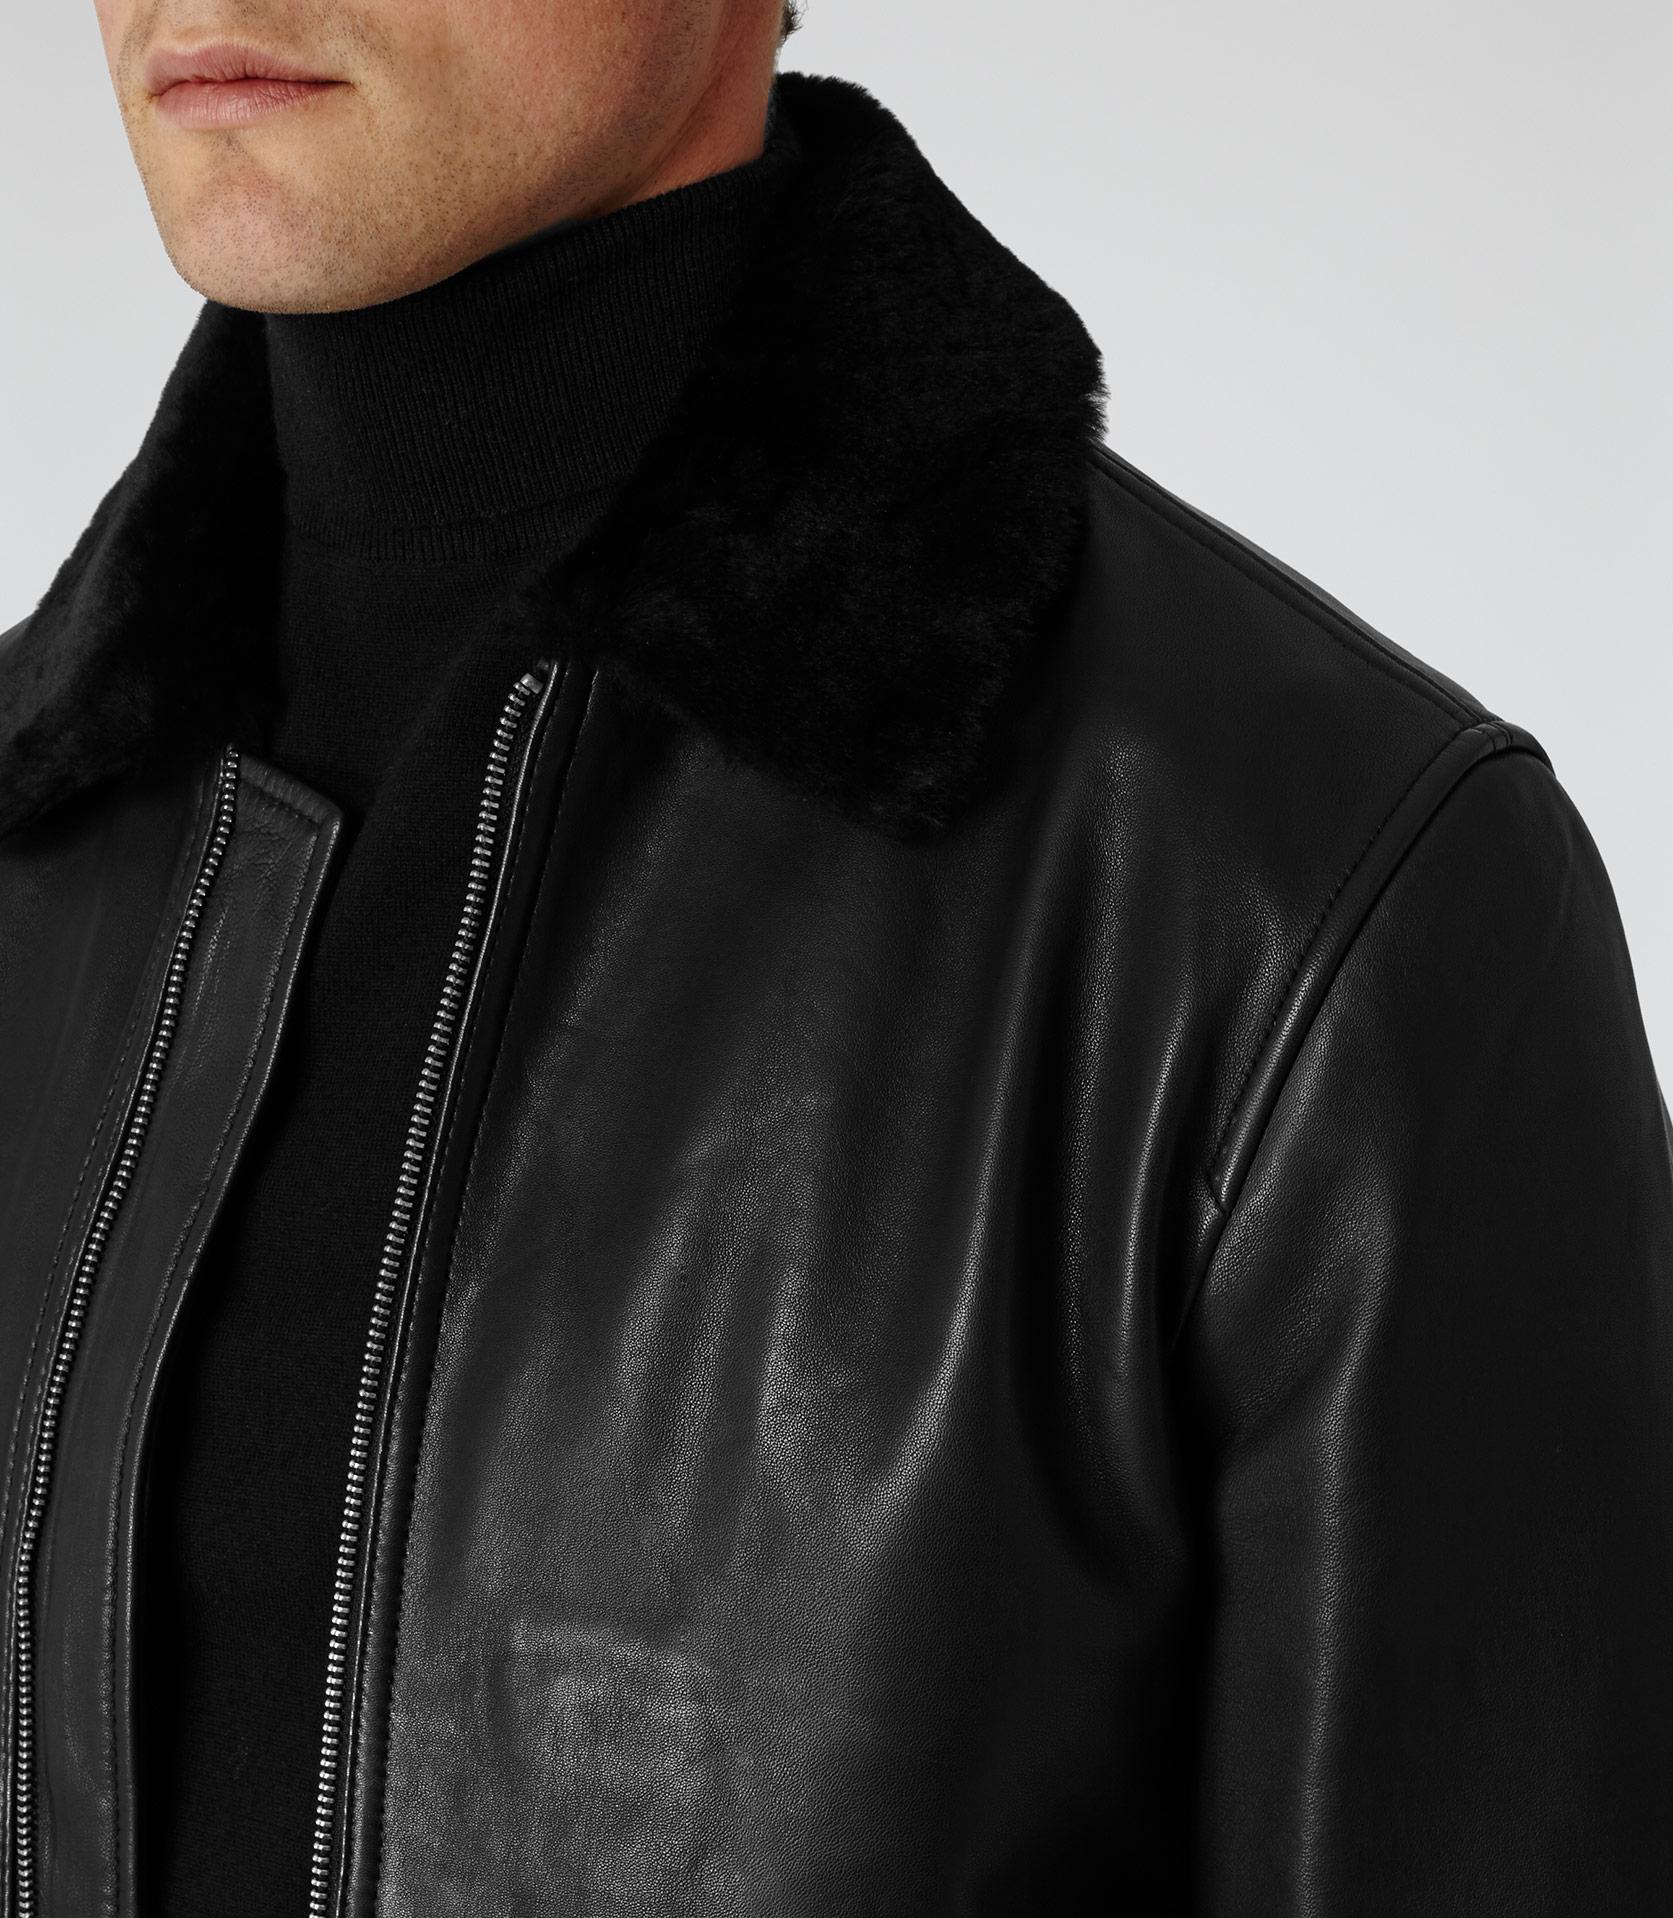 326f26ea6 Mens leather jacket fur collar : Desert tires